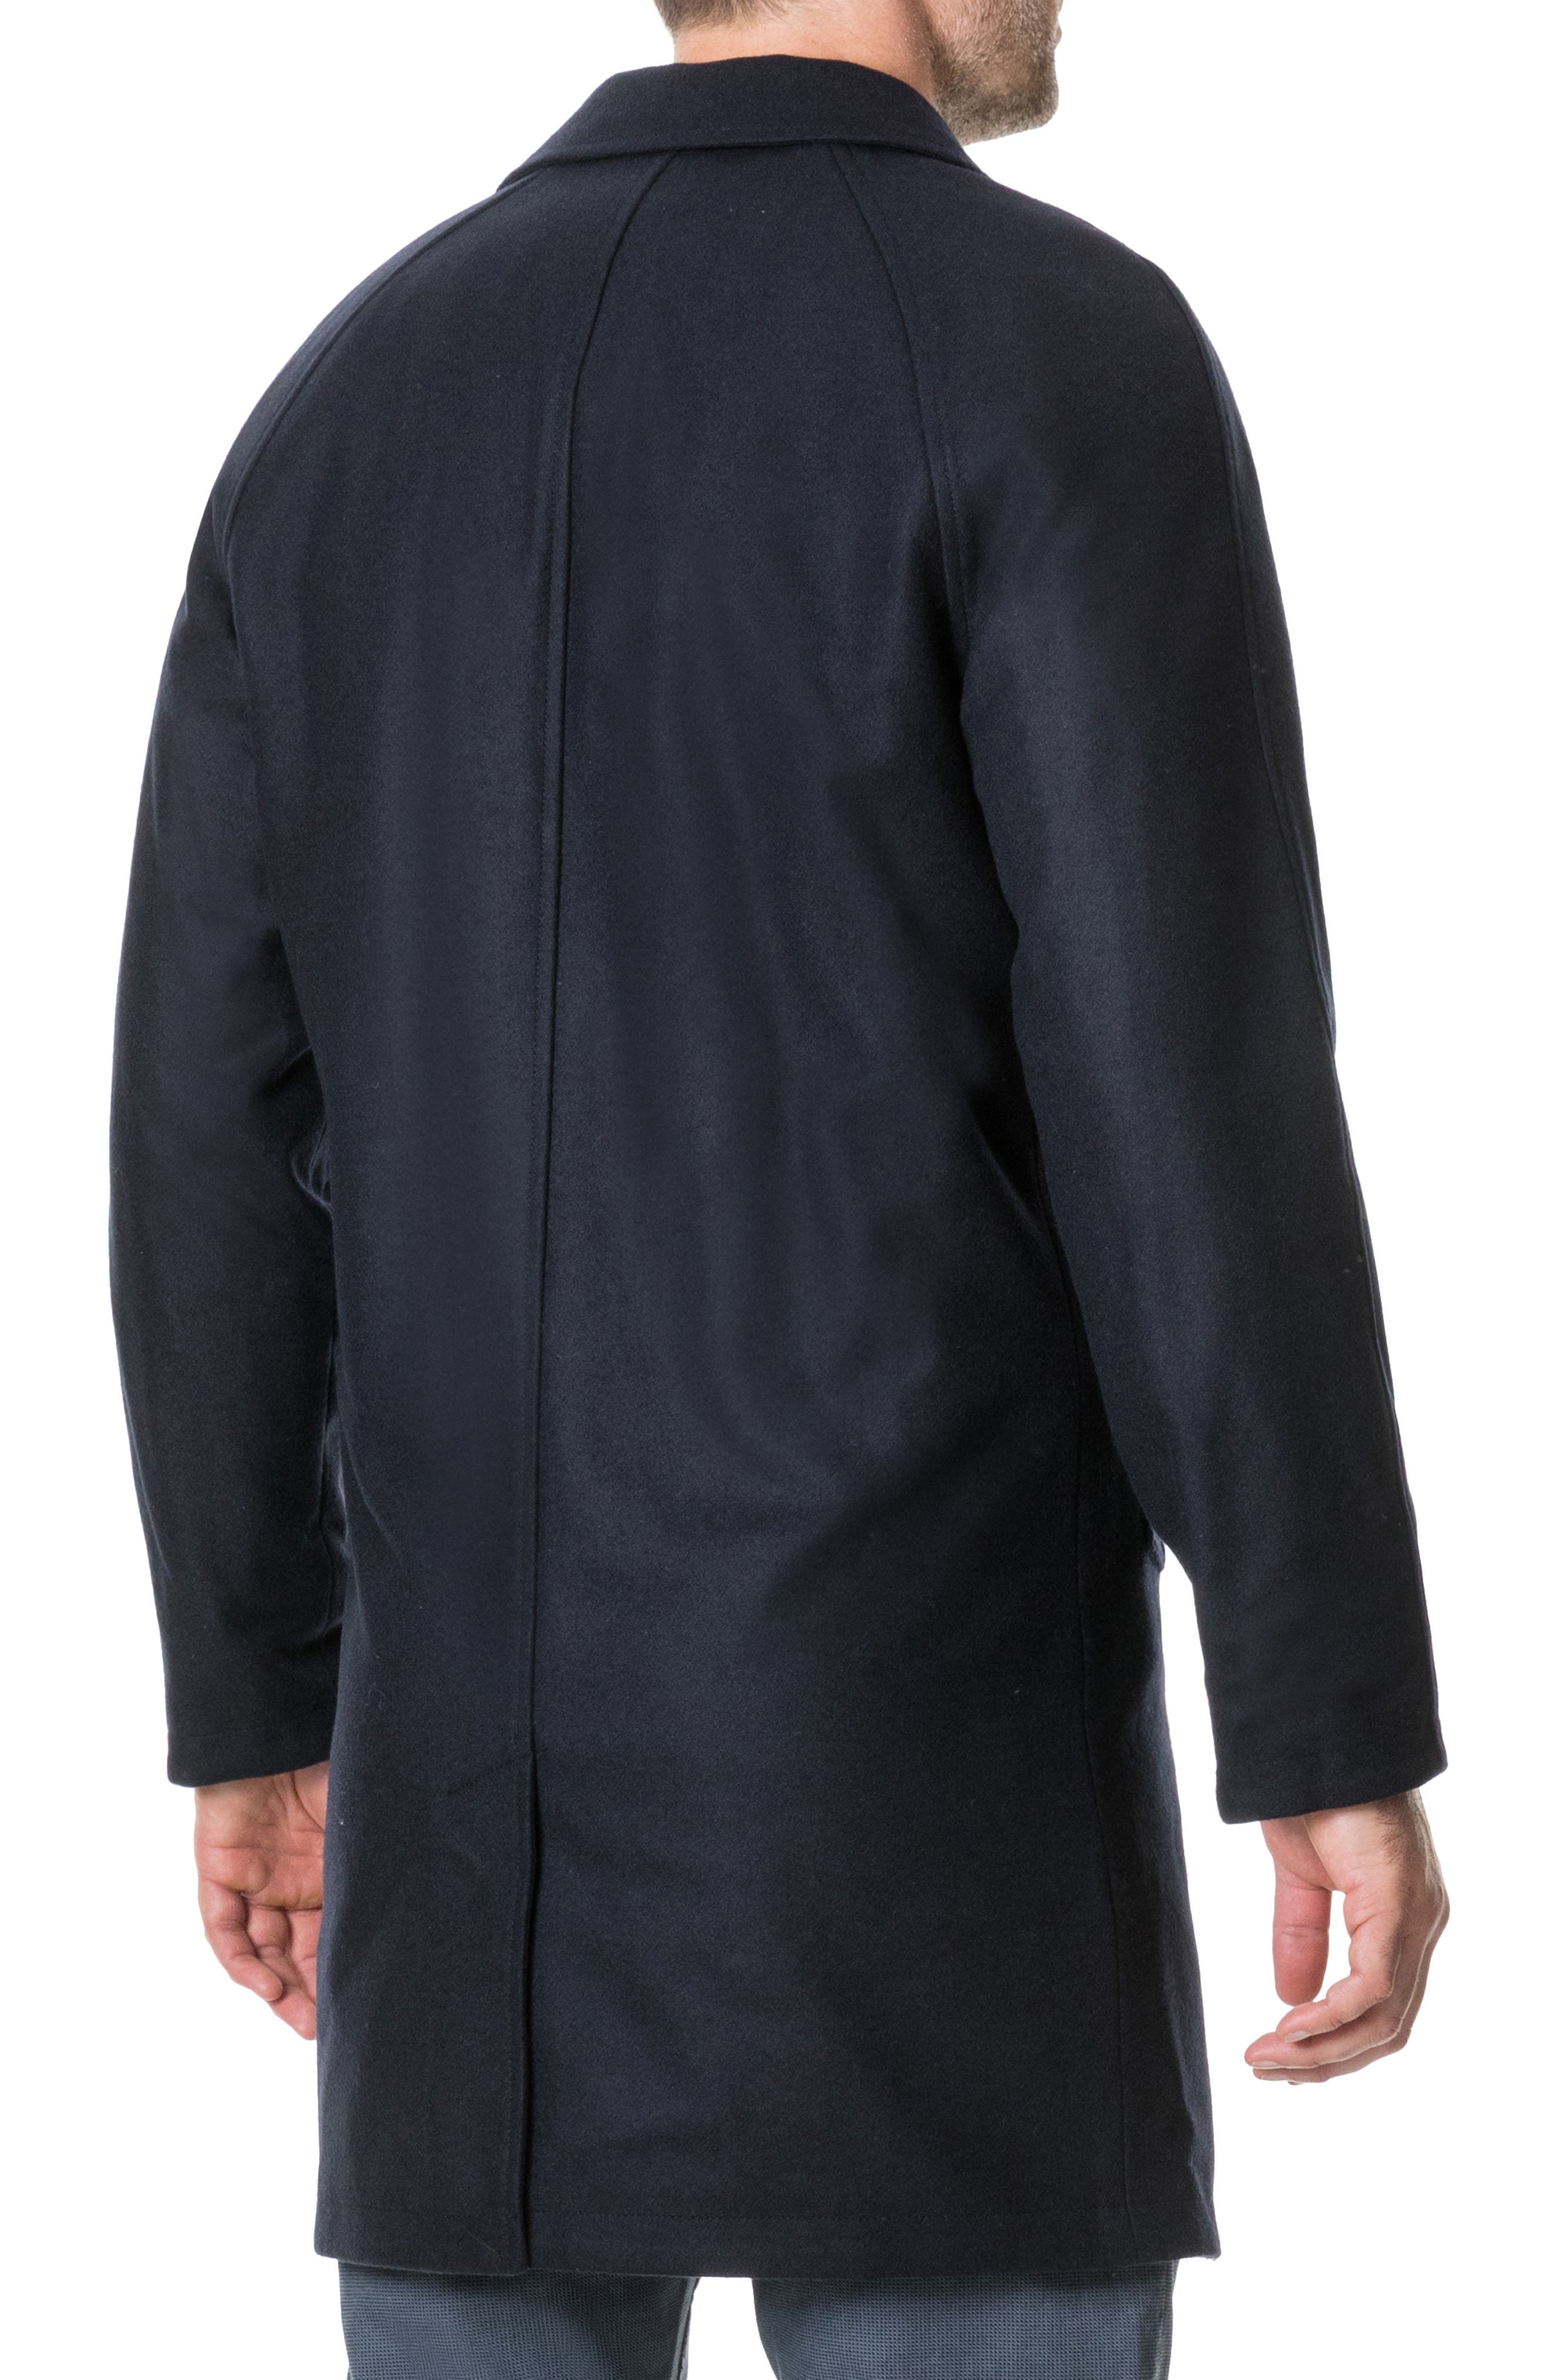 Templars Island Reversible Overcoat,                             Alternate thumbnail 2, color,                             CHARCOAL